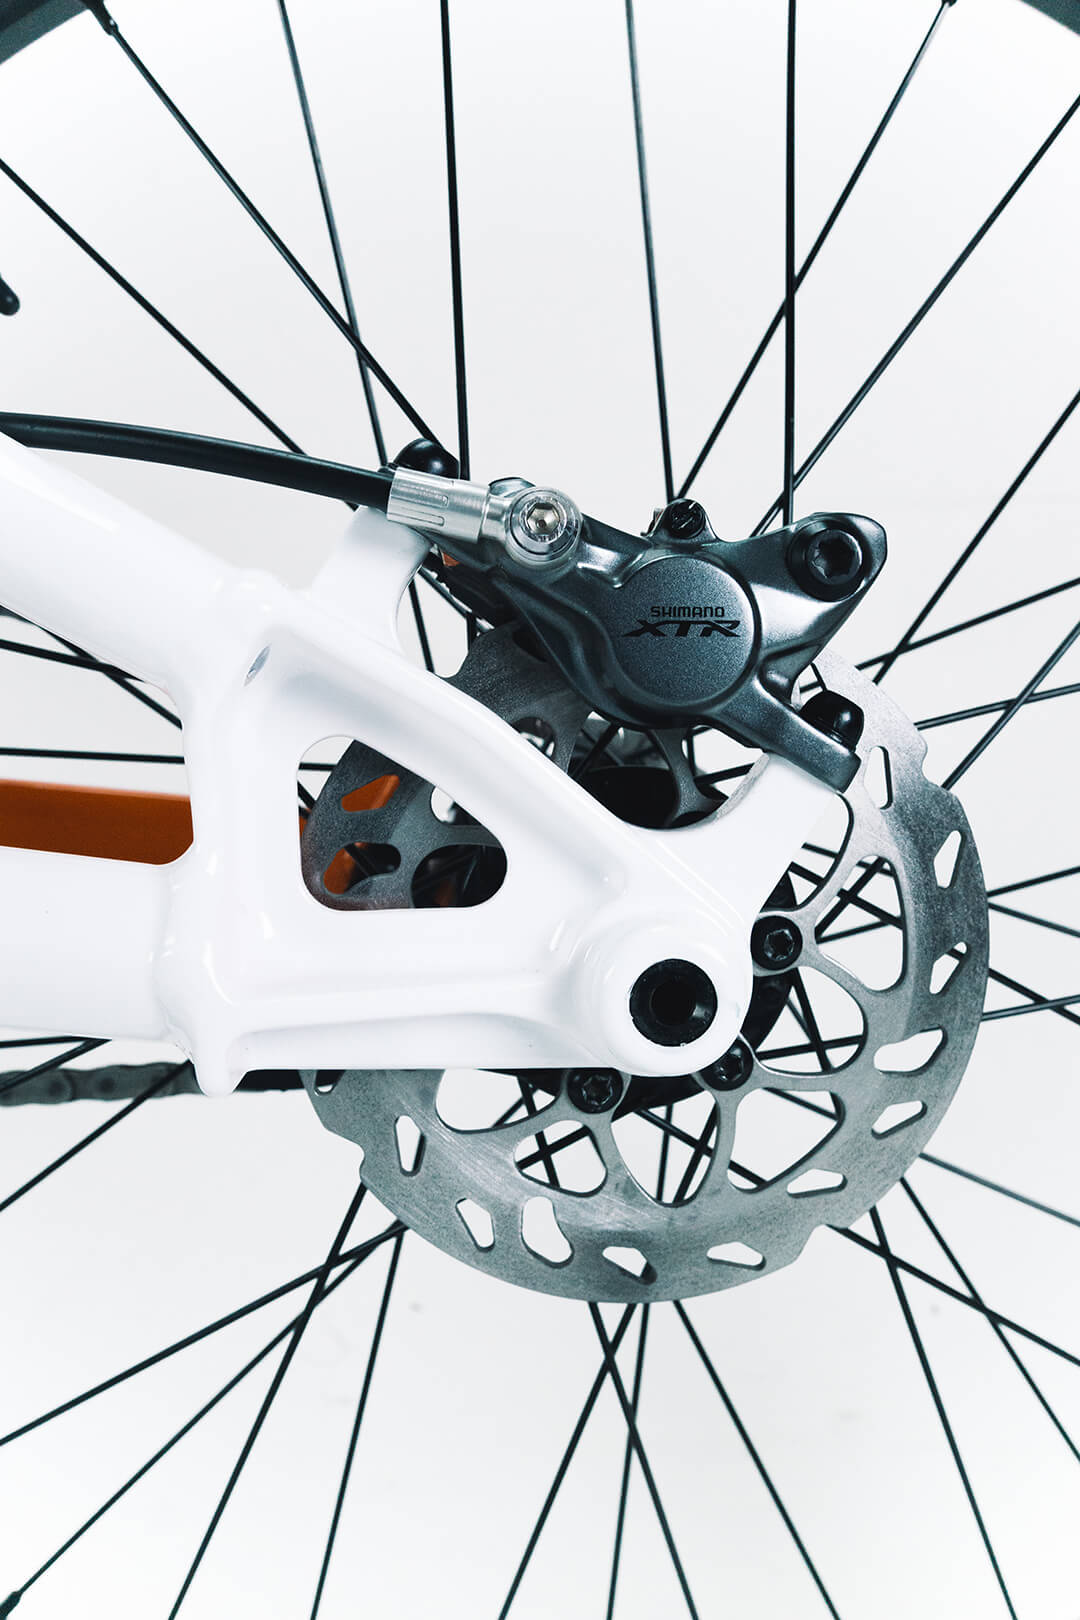 Niels Bensink Meybo OS20 Pump Track Worlds Custom 12